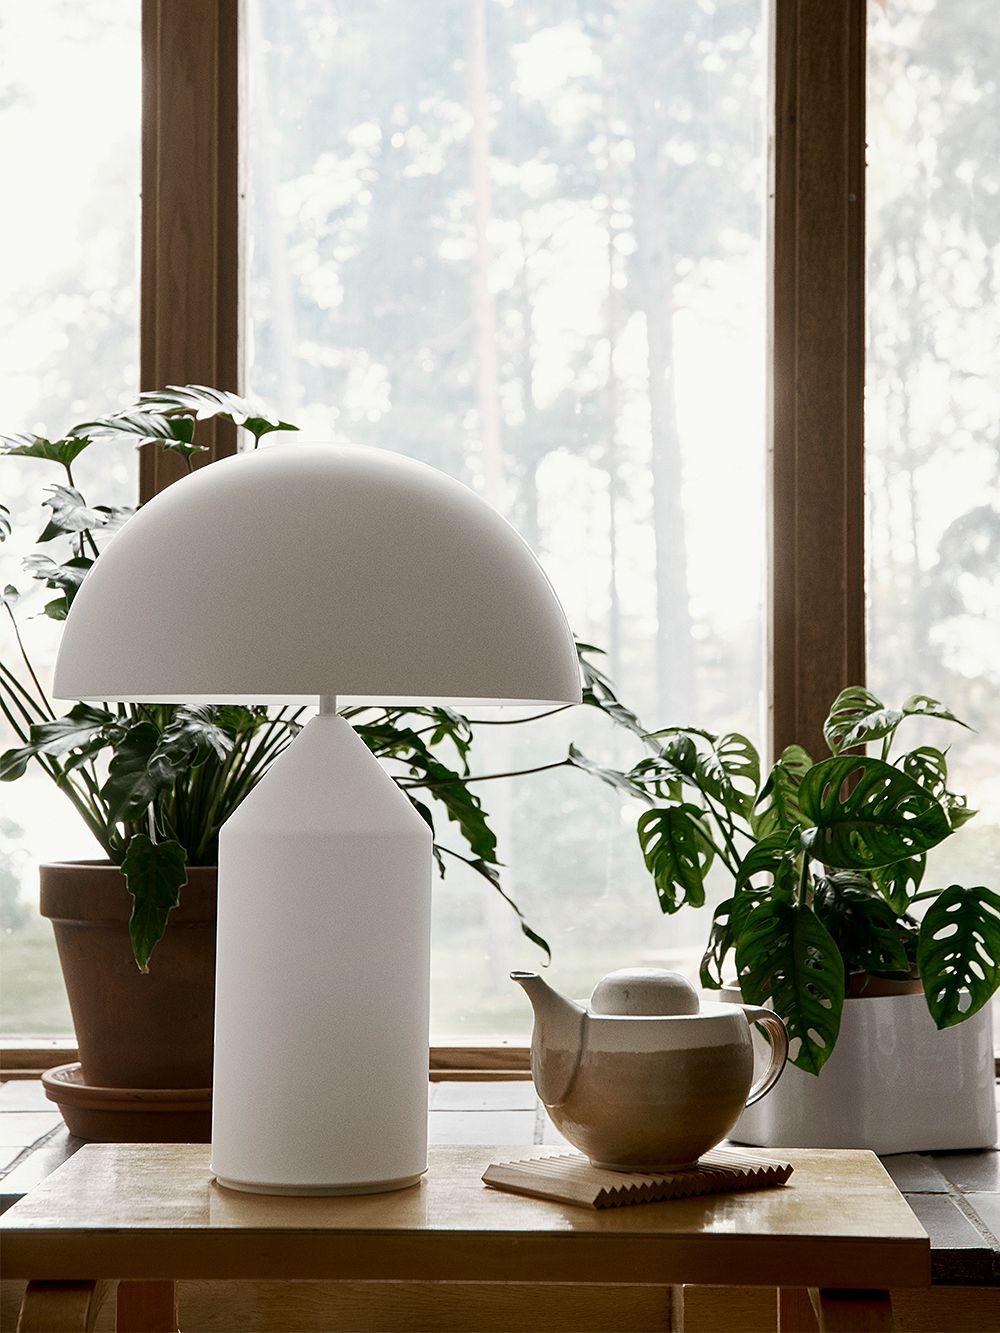 Oluce's white table lamp, Atollo 235, in living room decor.